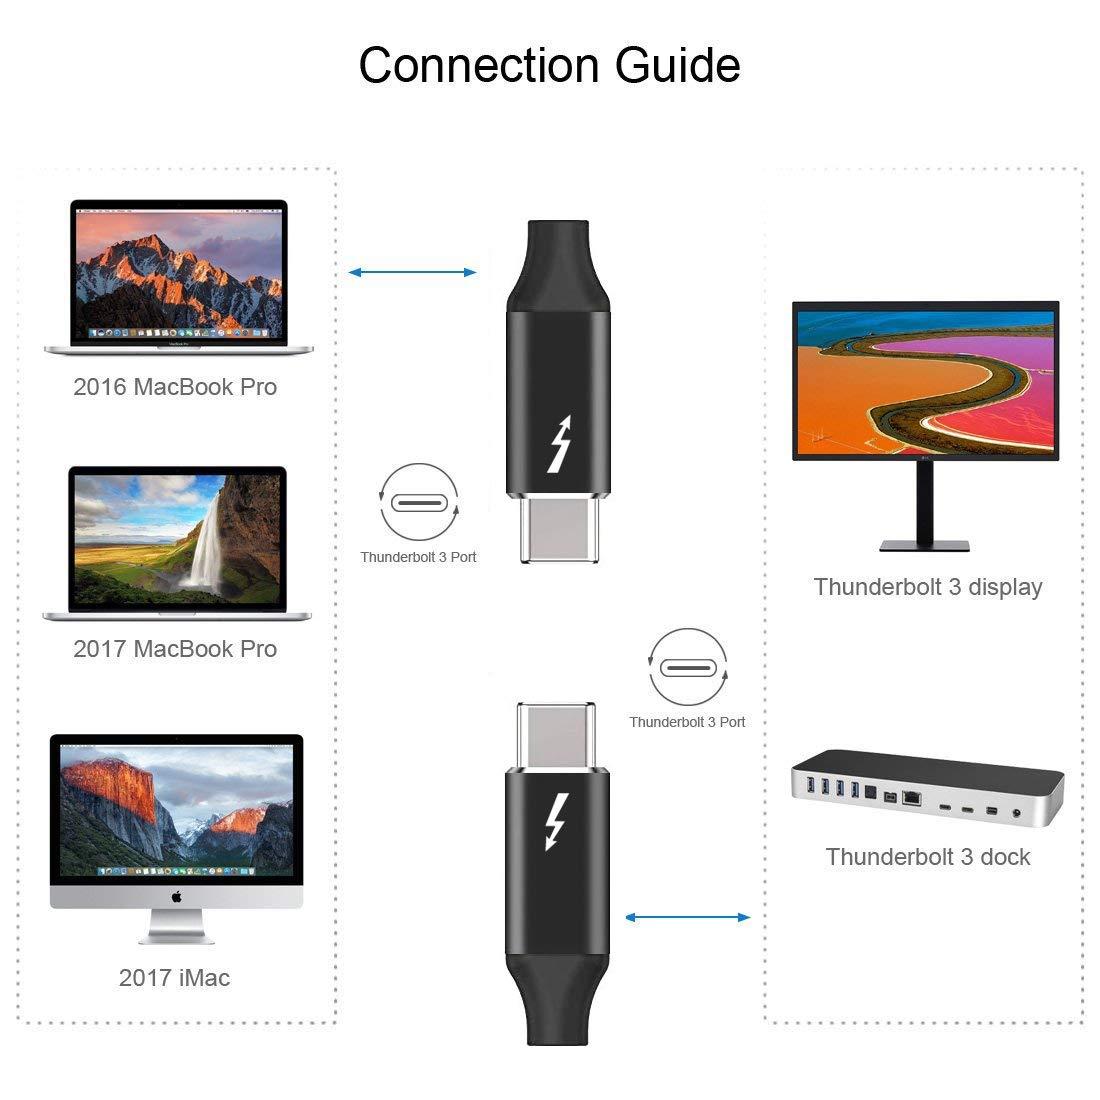 Nylon Braided Thunderbolt 3 Cable USB C Devices Adapter 6.6ft 20V//5A Thunderbolt 3 to Thunderbolt 3 Cord for Thunderbolt 3 Hub 2m 100W 20Gbps